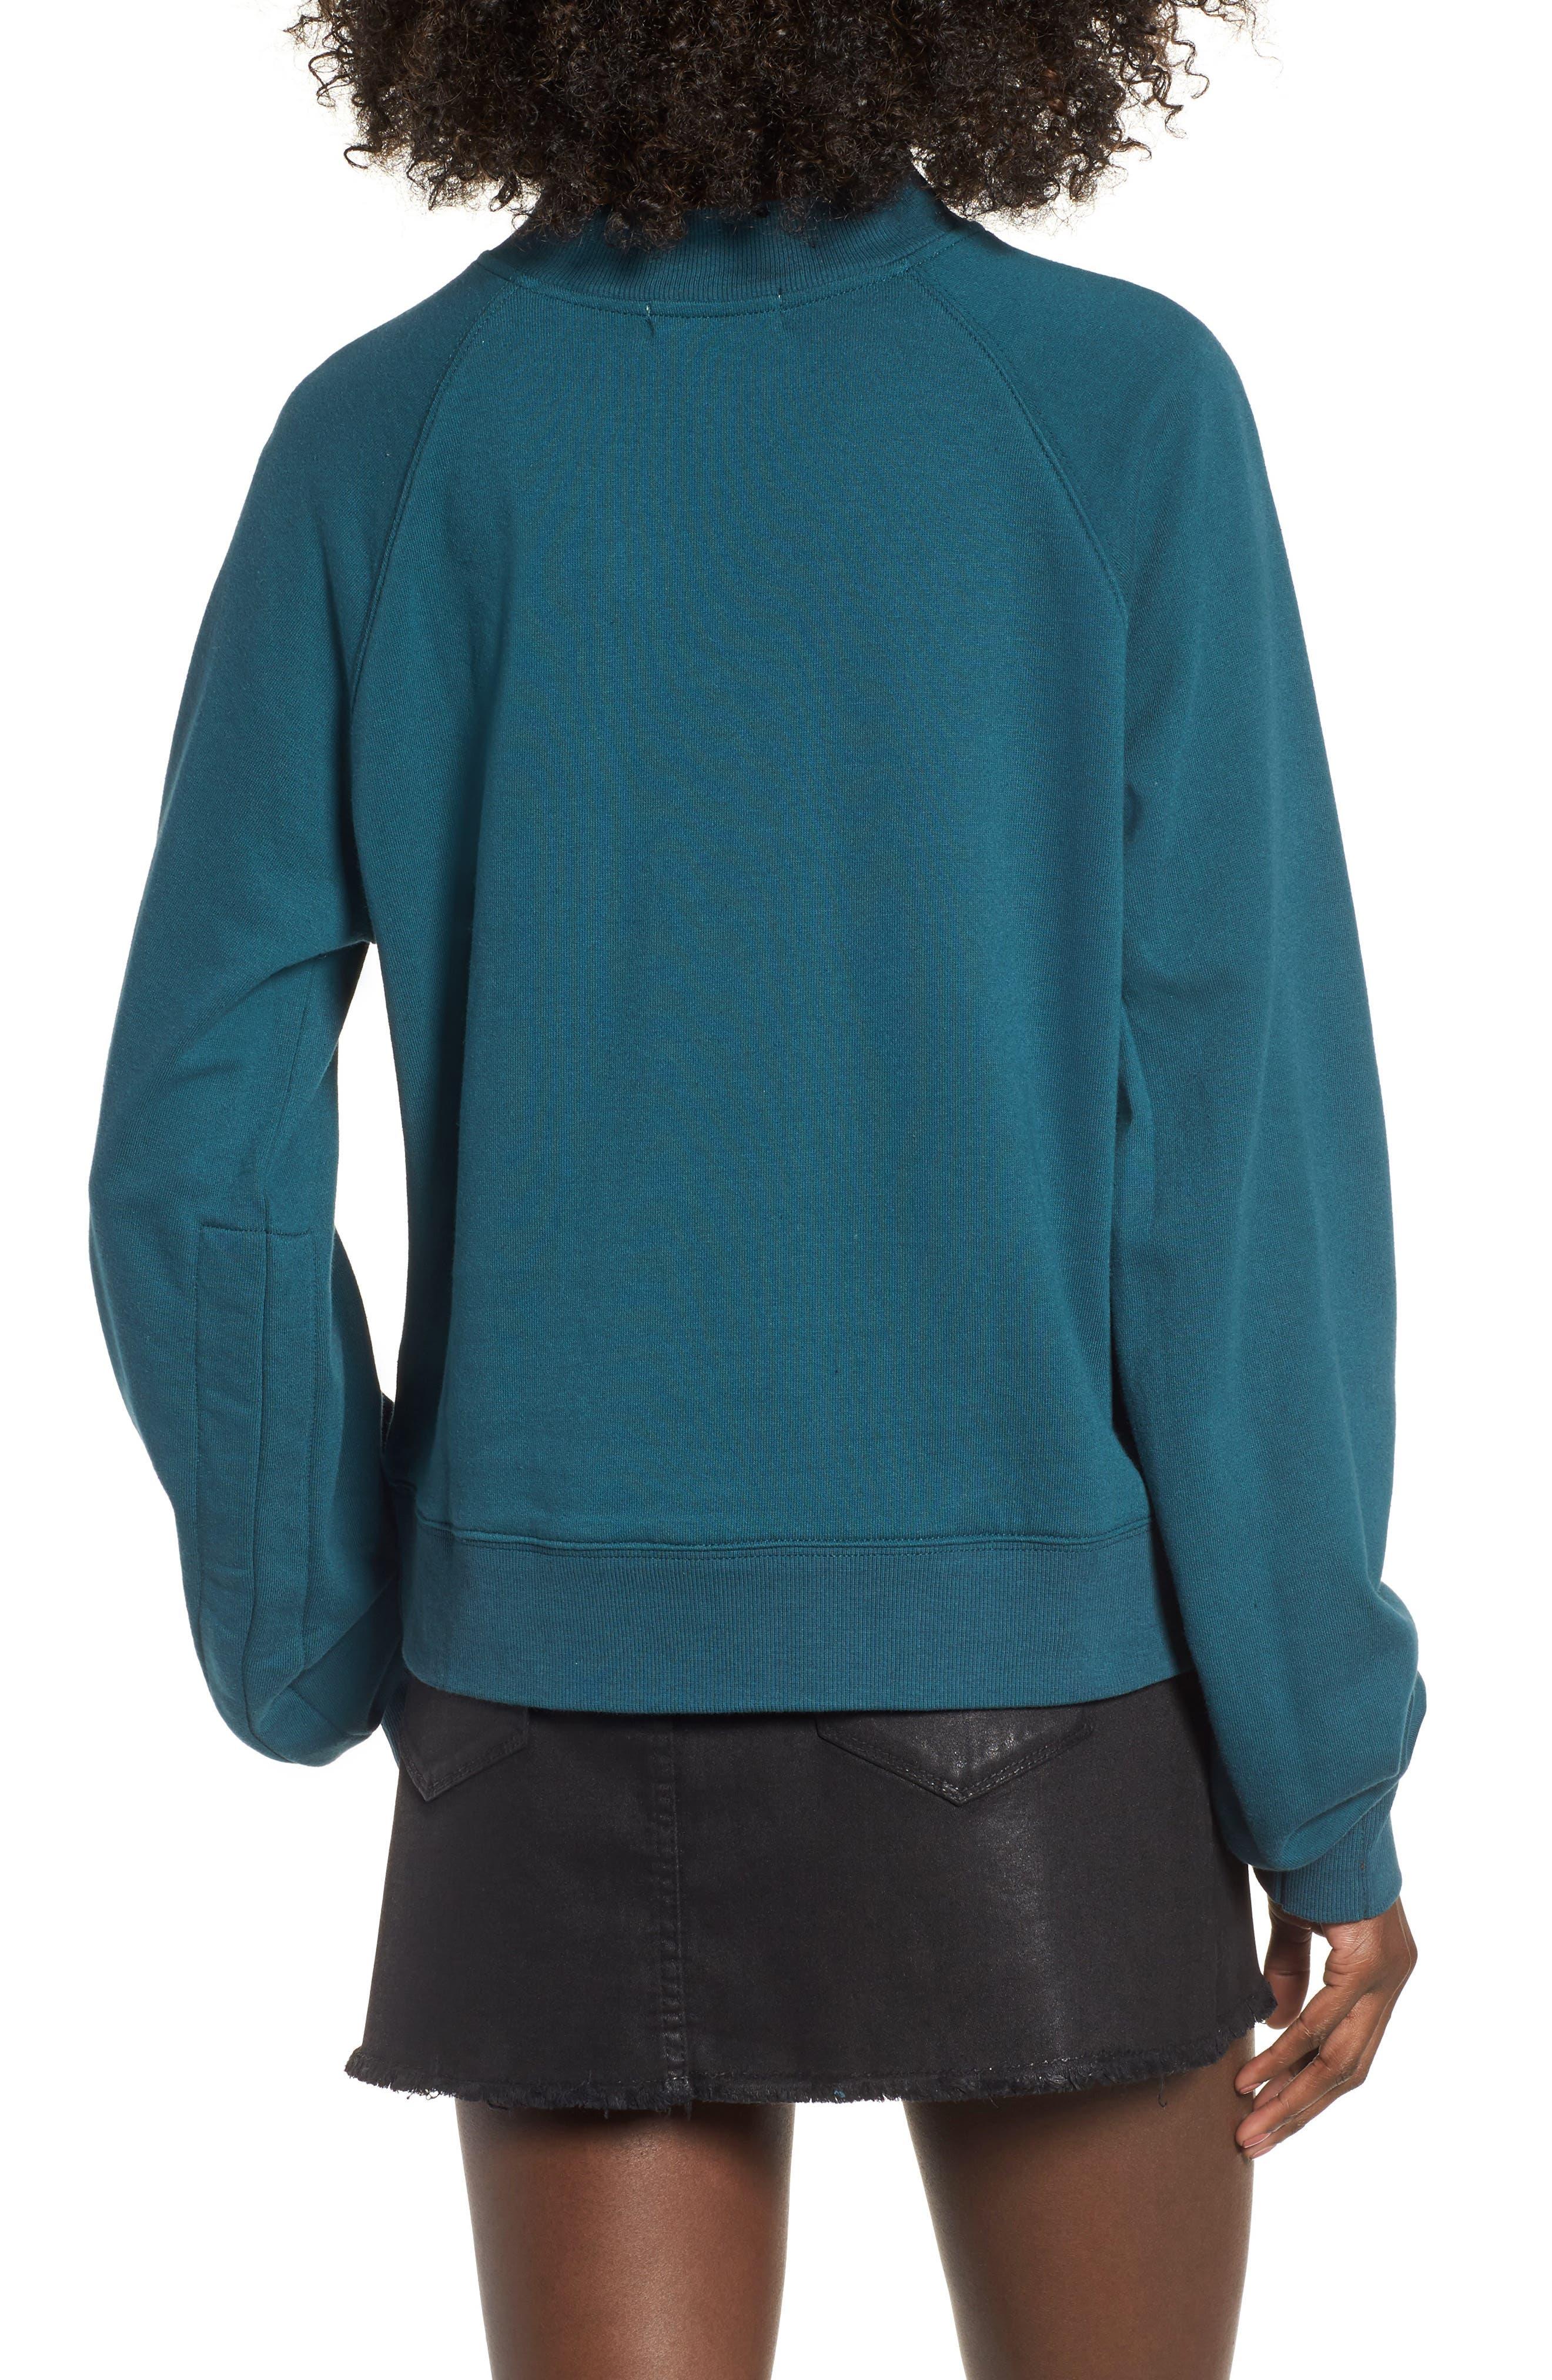 Cinched Sleeve Sweatshirt,                             Alternate thumbnail 2, color,                             Teal